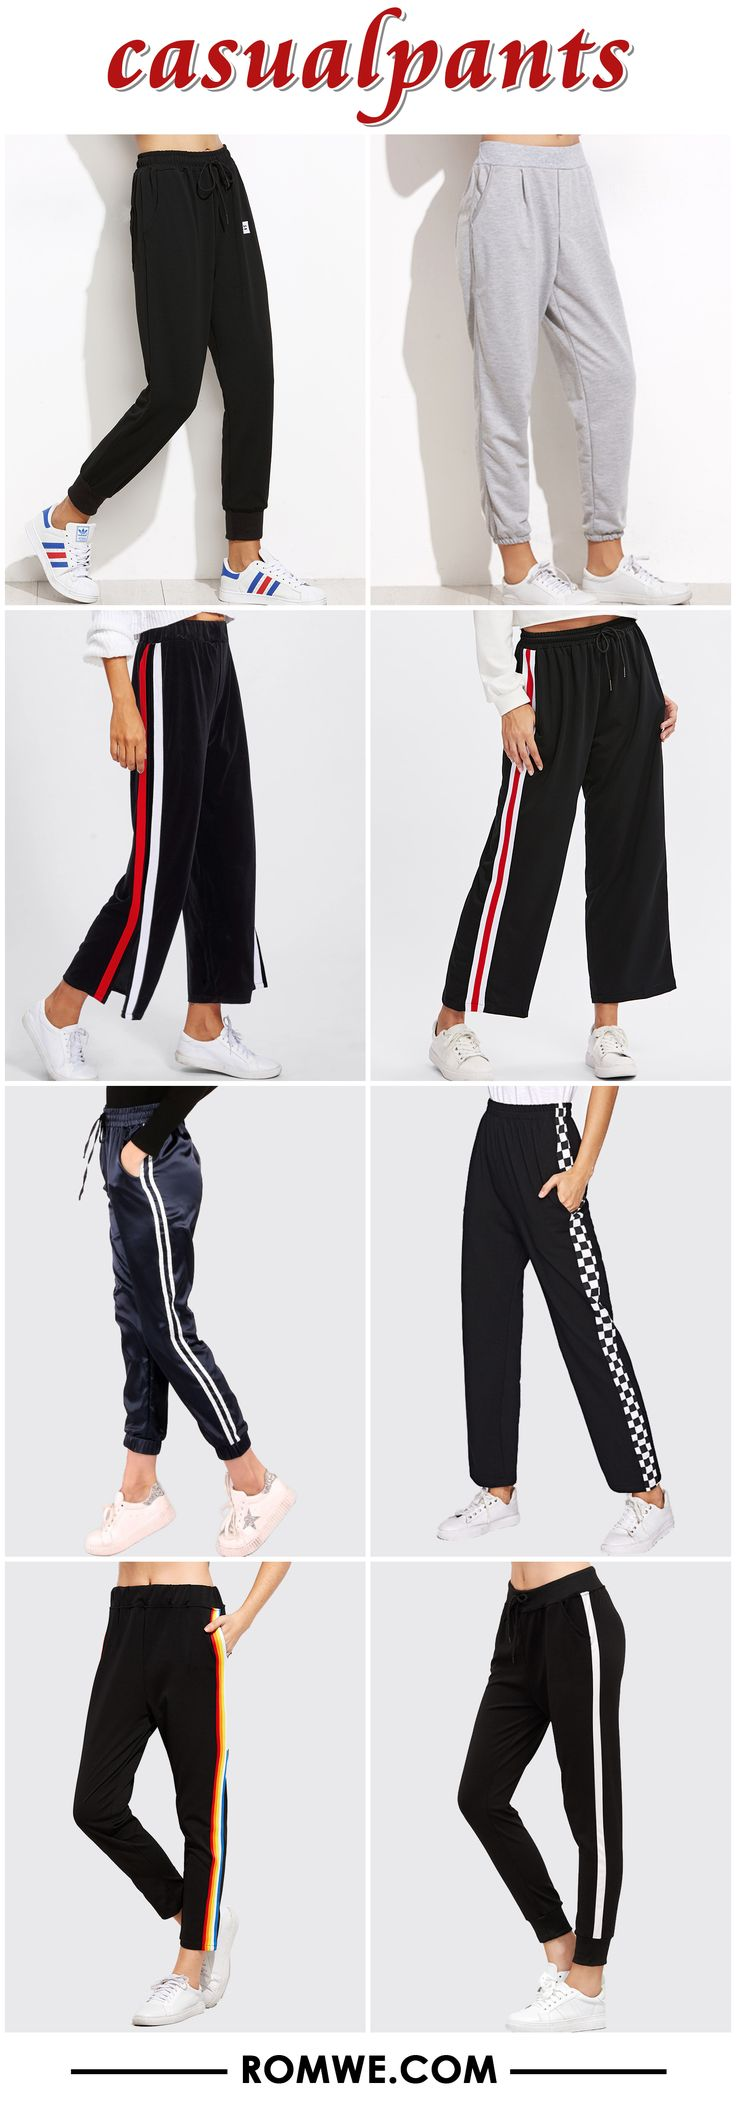 black friday sale - casual pants 2017 - romwe.com